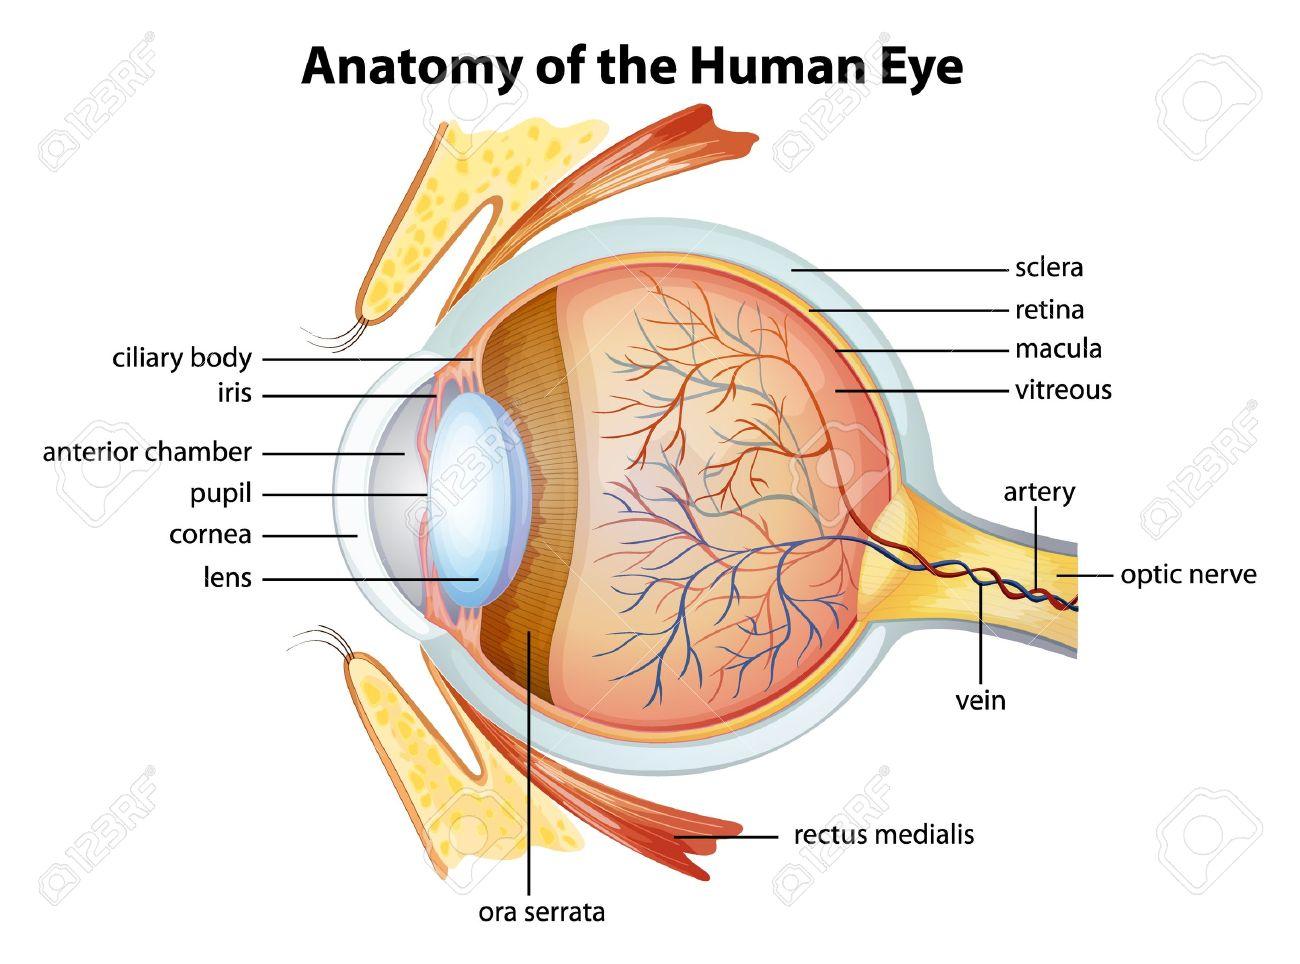 Illustration Of The Human Eye Anatomy Royalty Free Cliparts ...